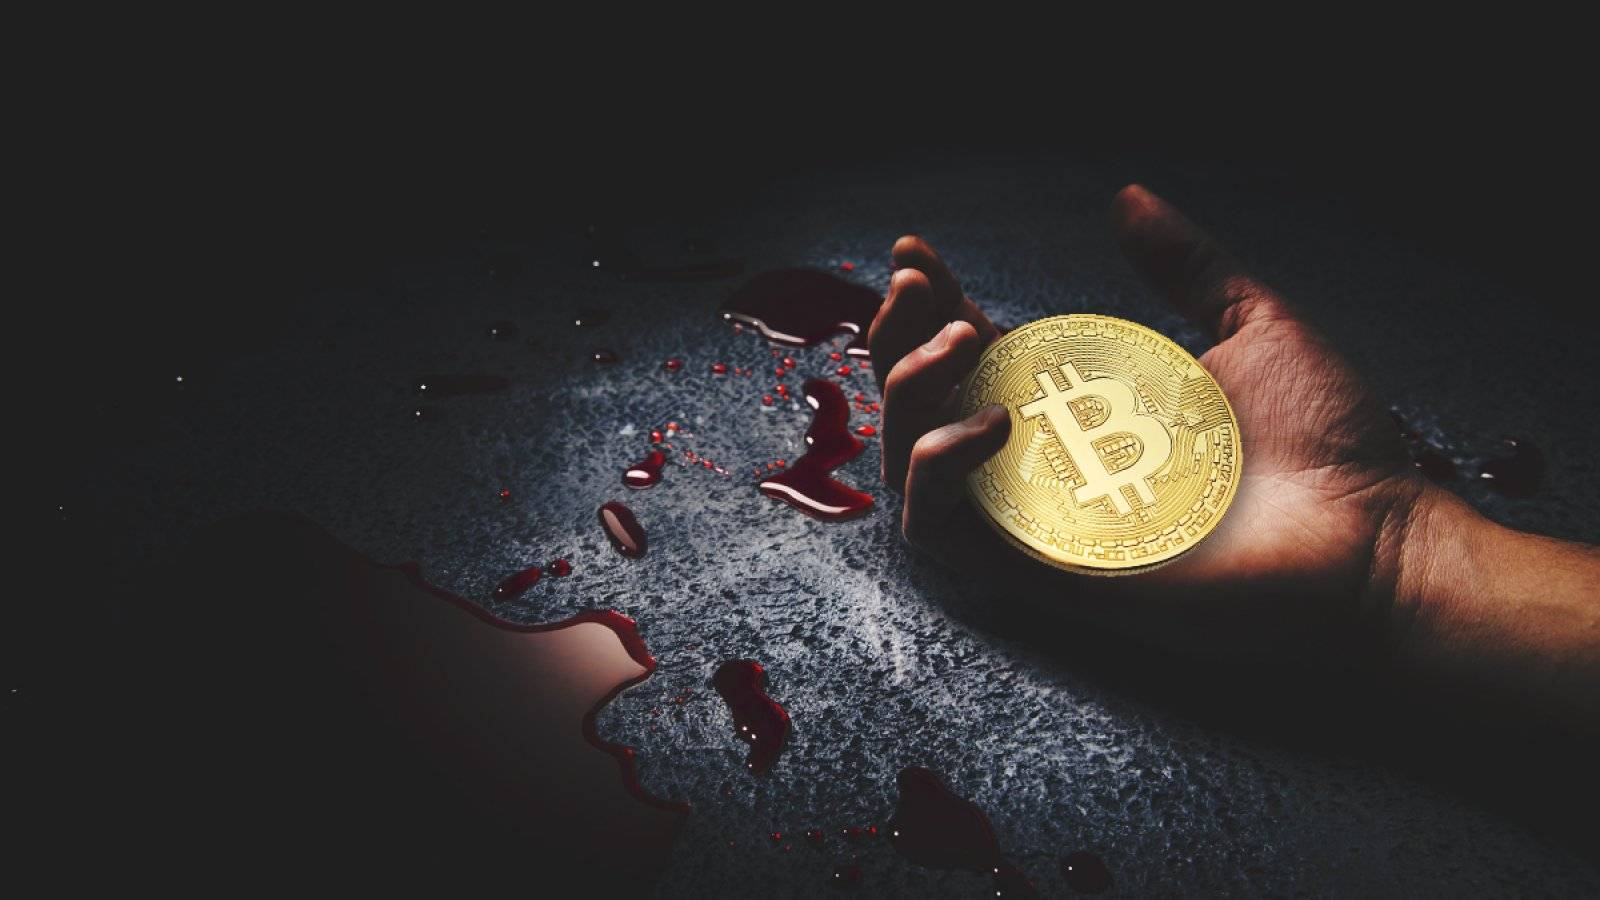 Les arnaques au Bitcoin font rage en Inde